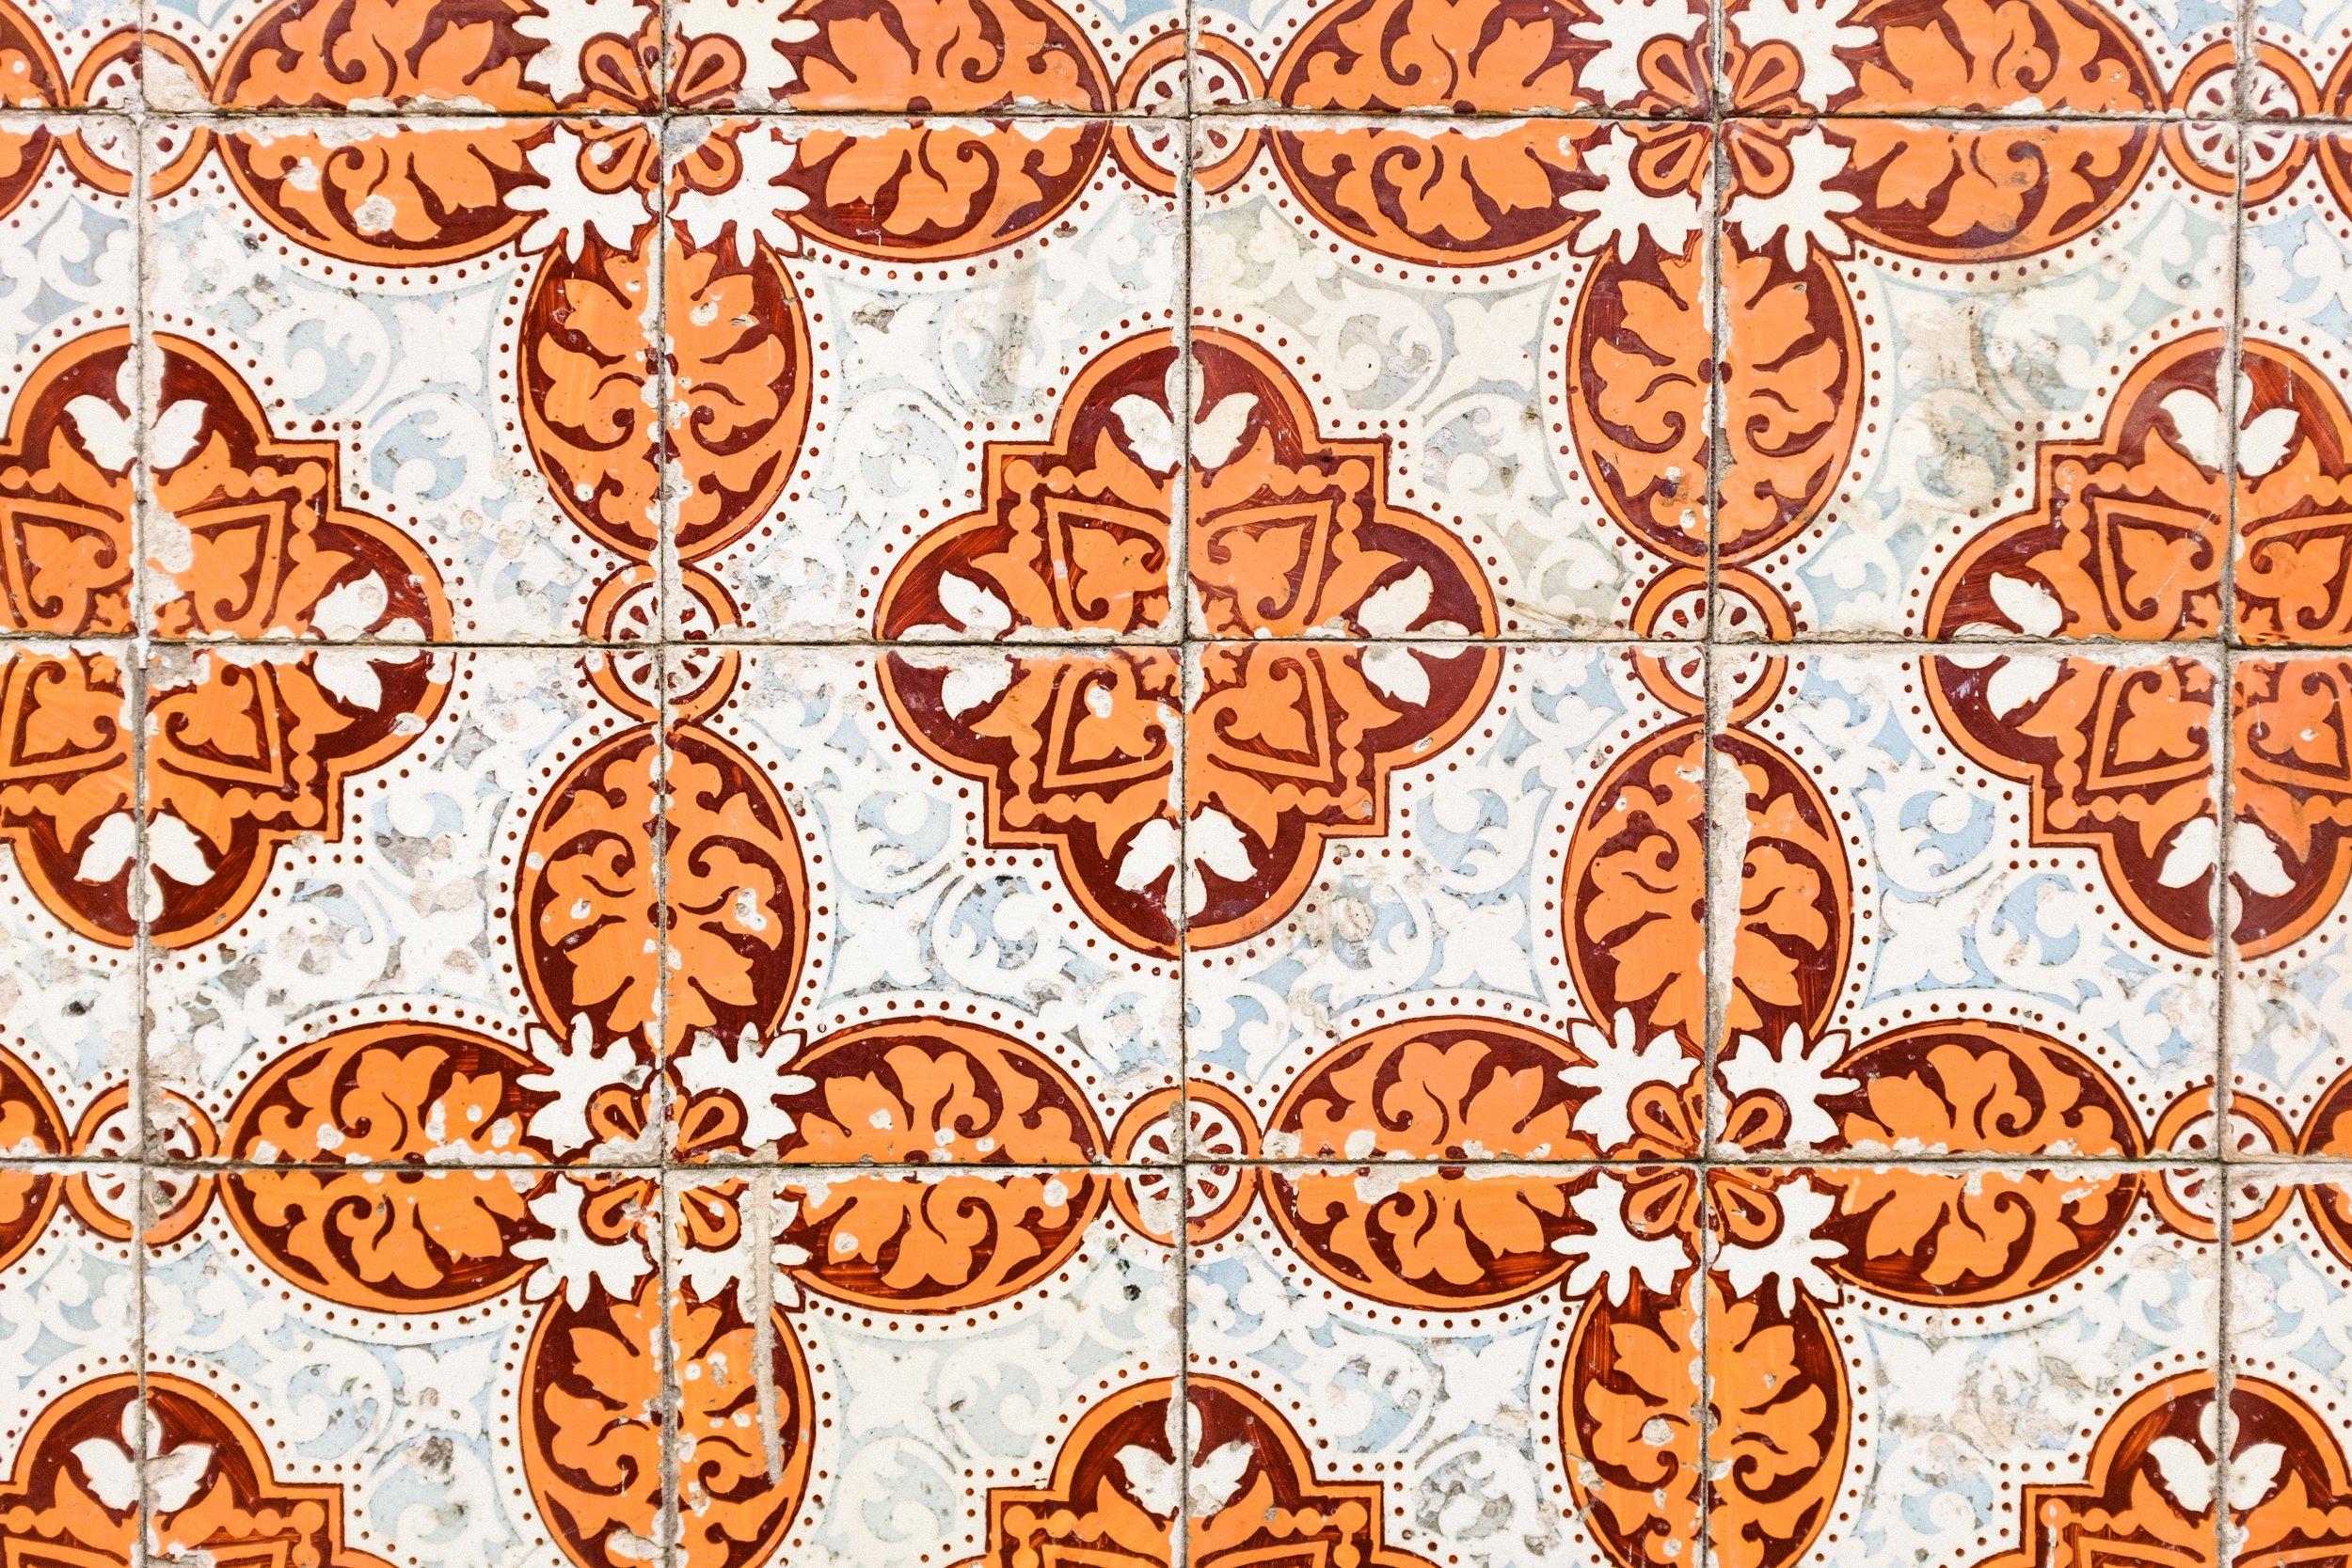 lisbon-portugal-azulejos-tiles-orange